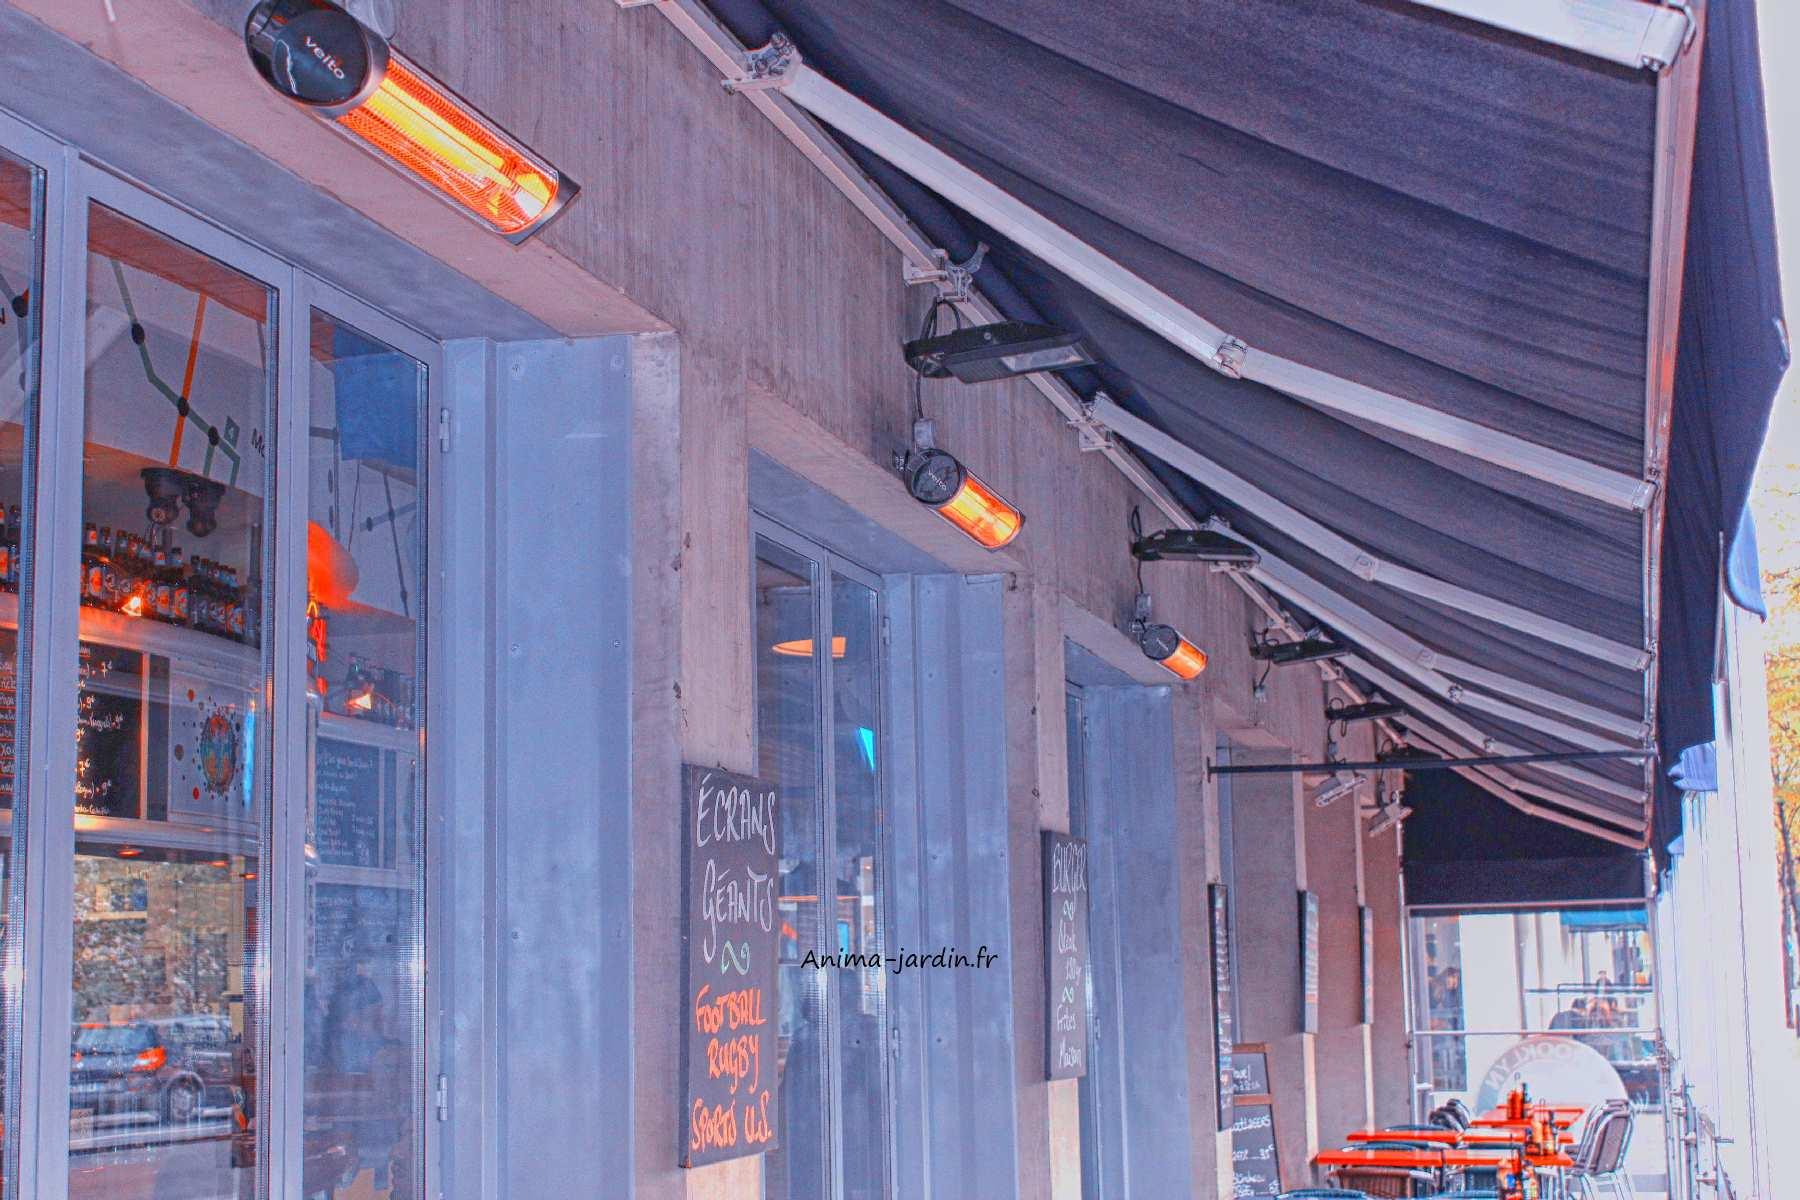 Chauffage de terrasse infrarouge finest chauffe terrasse for Chauffage mural quigg